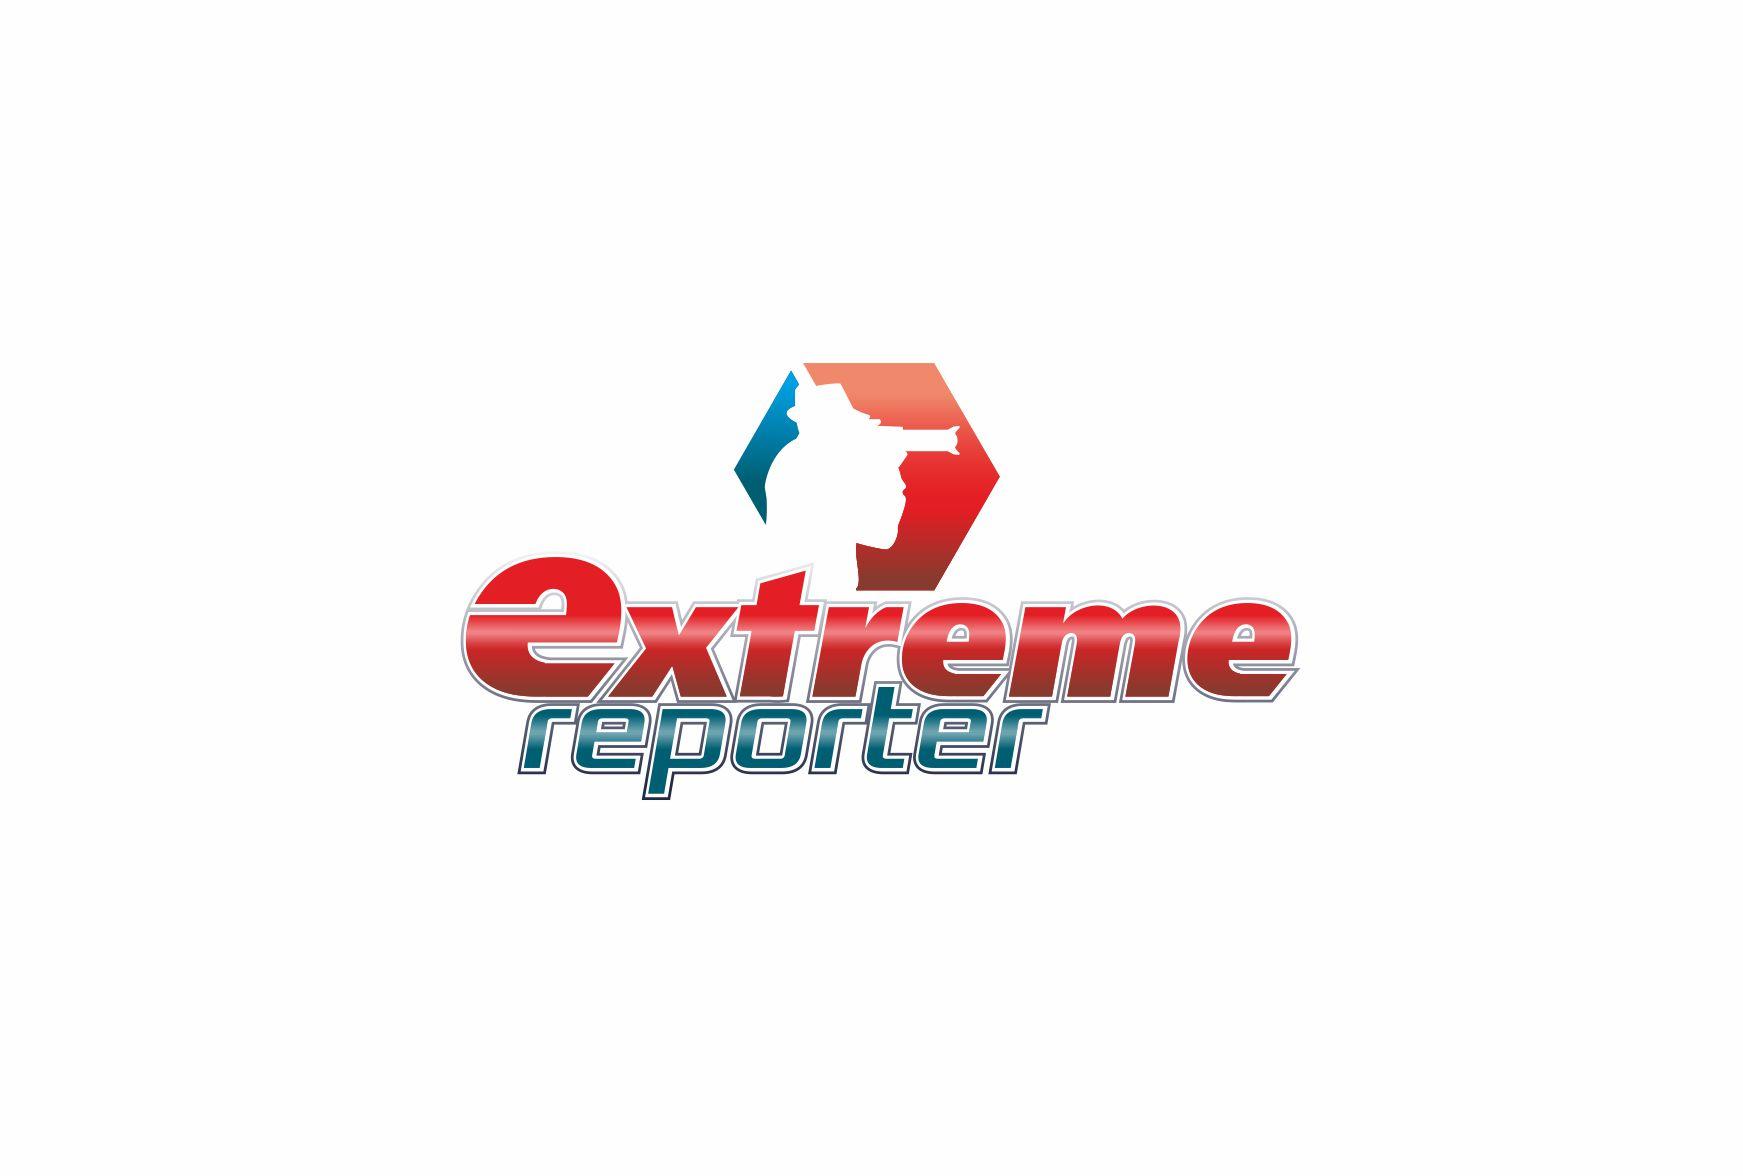 Логотип для экстрим фотографа.  фото f_6145a527b8480492.jpg